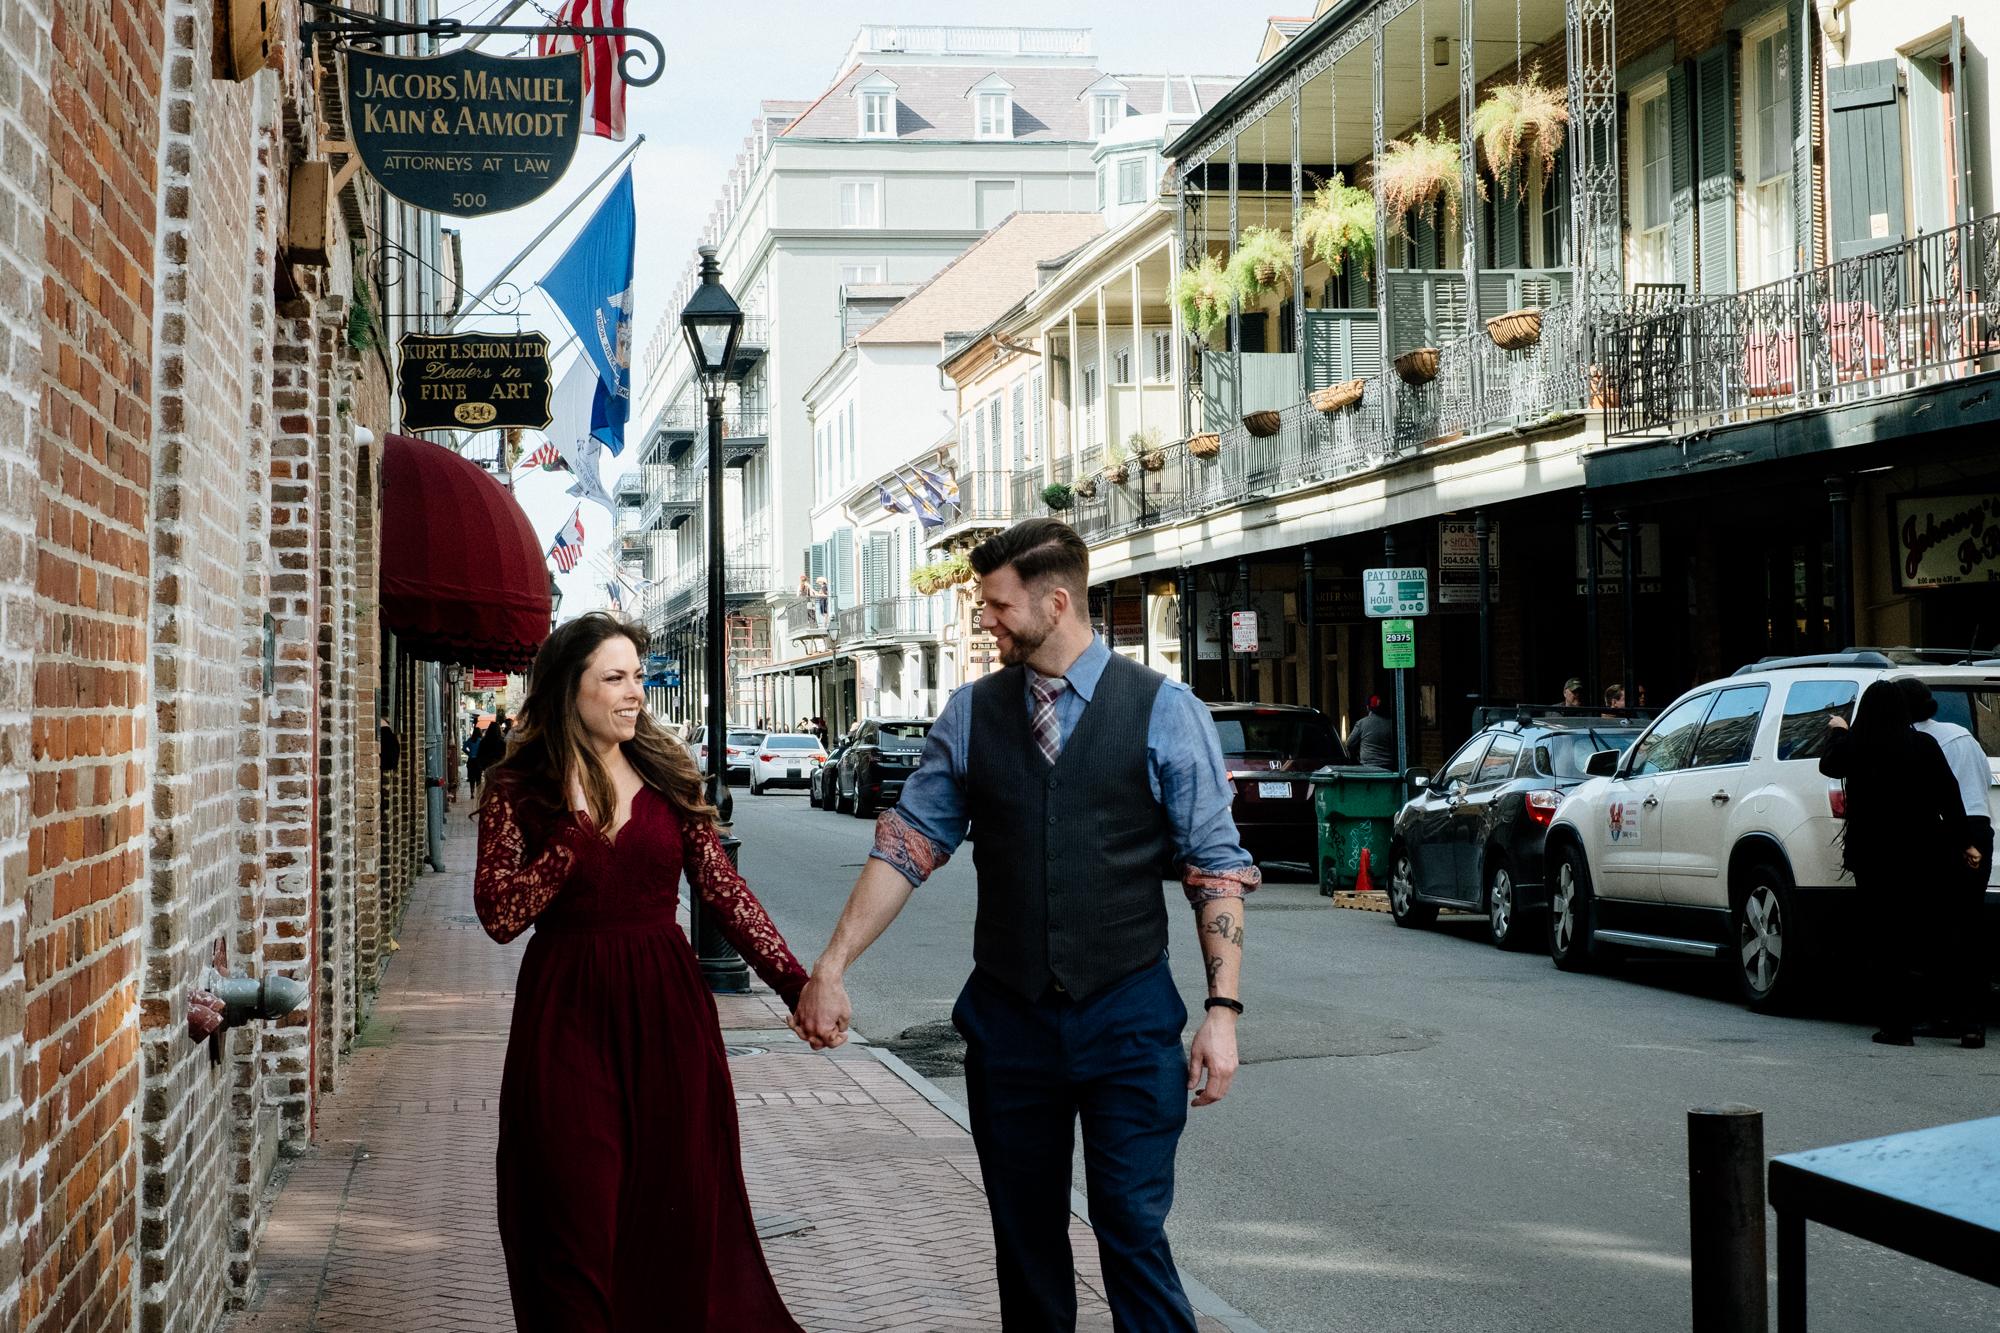 Jen_Montgomery_Photography_Angela_Brian_Engagement_Proposal_FB-58.jpg